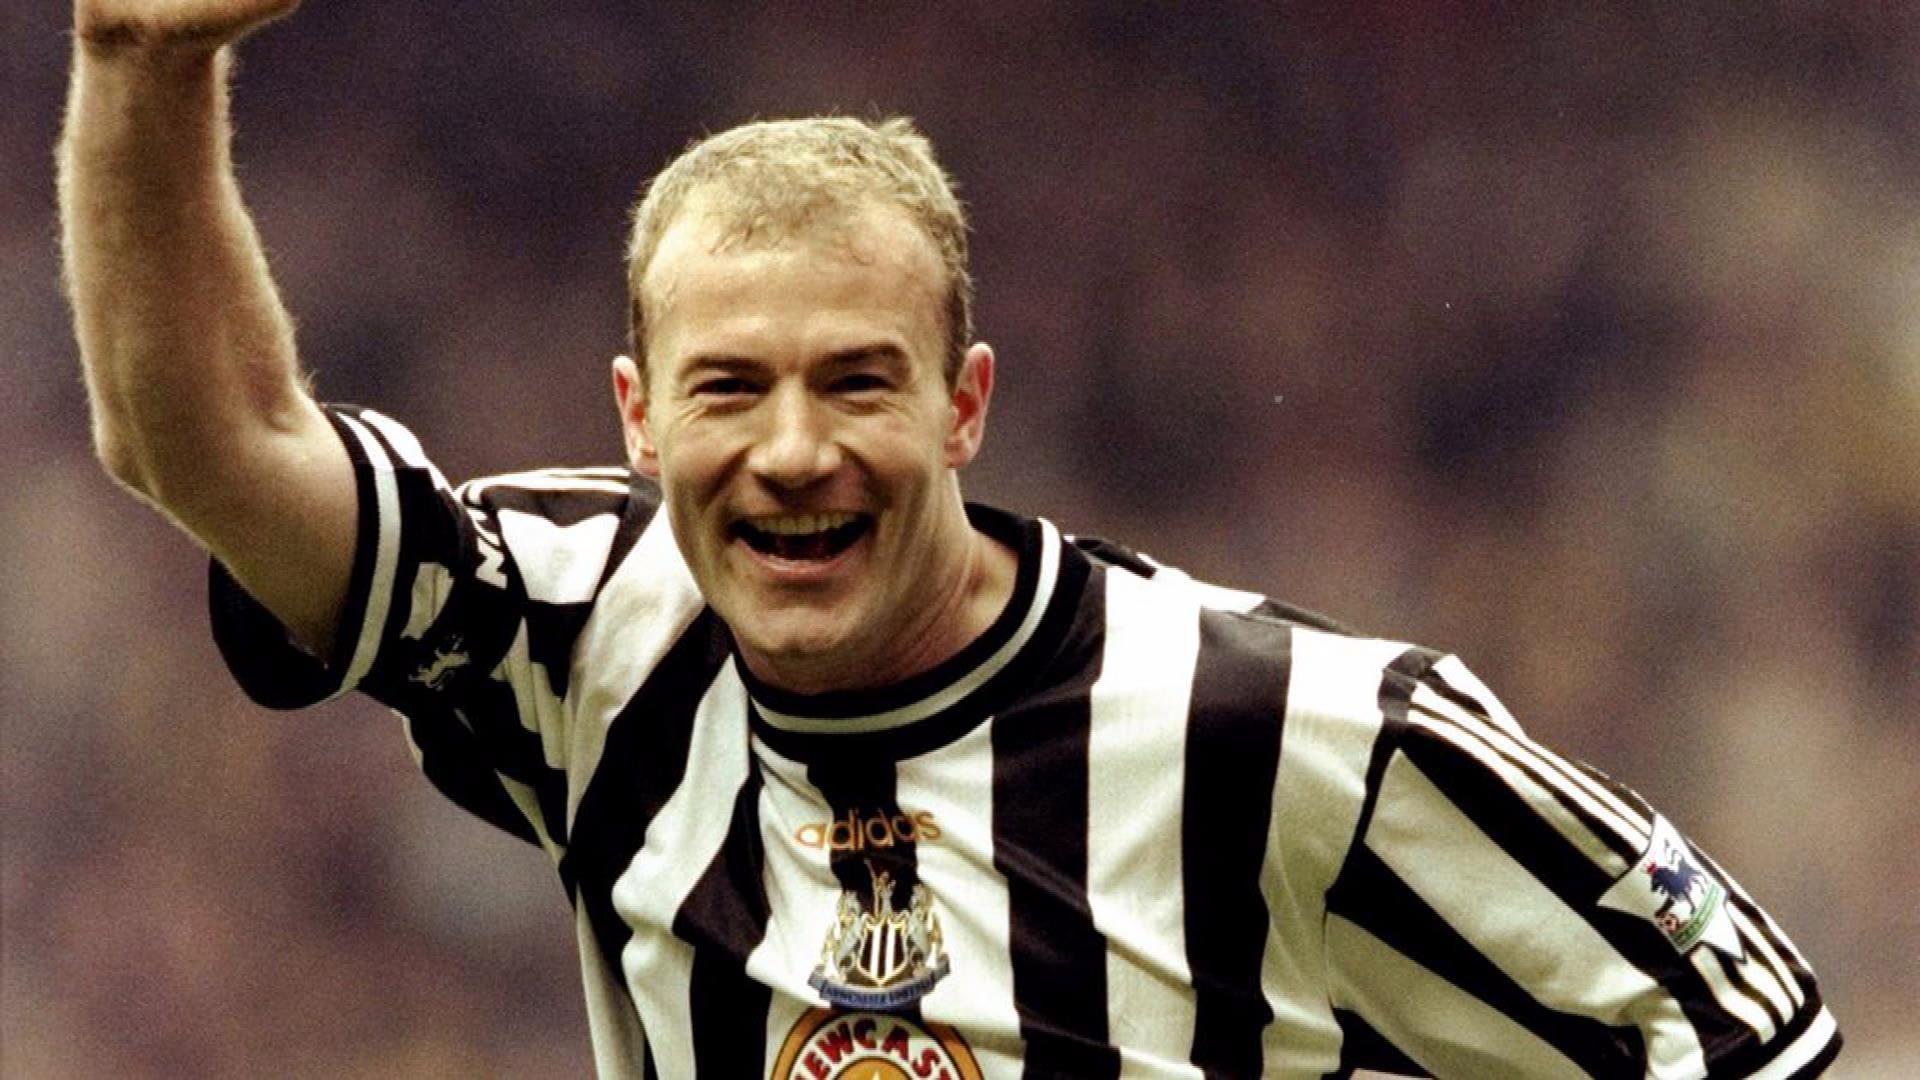 10 chân sút vĩ đại nhất lịch sử Premier League: Sergio Aguero ở đâu? - Bóng Đá